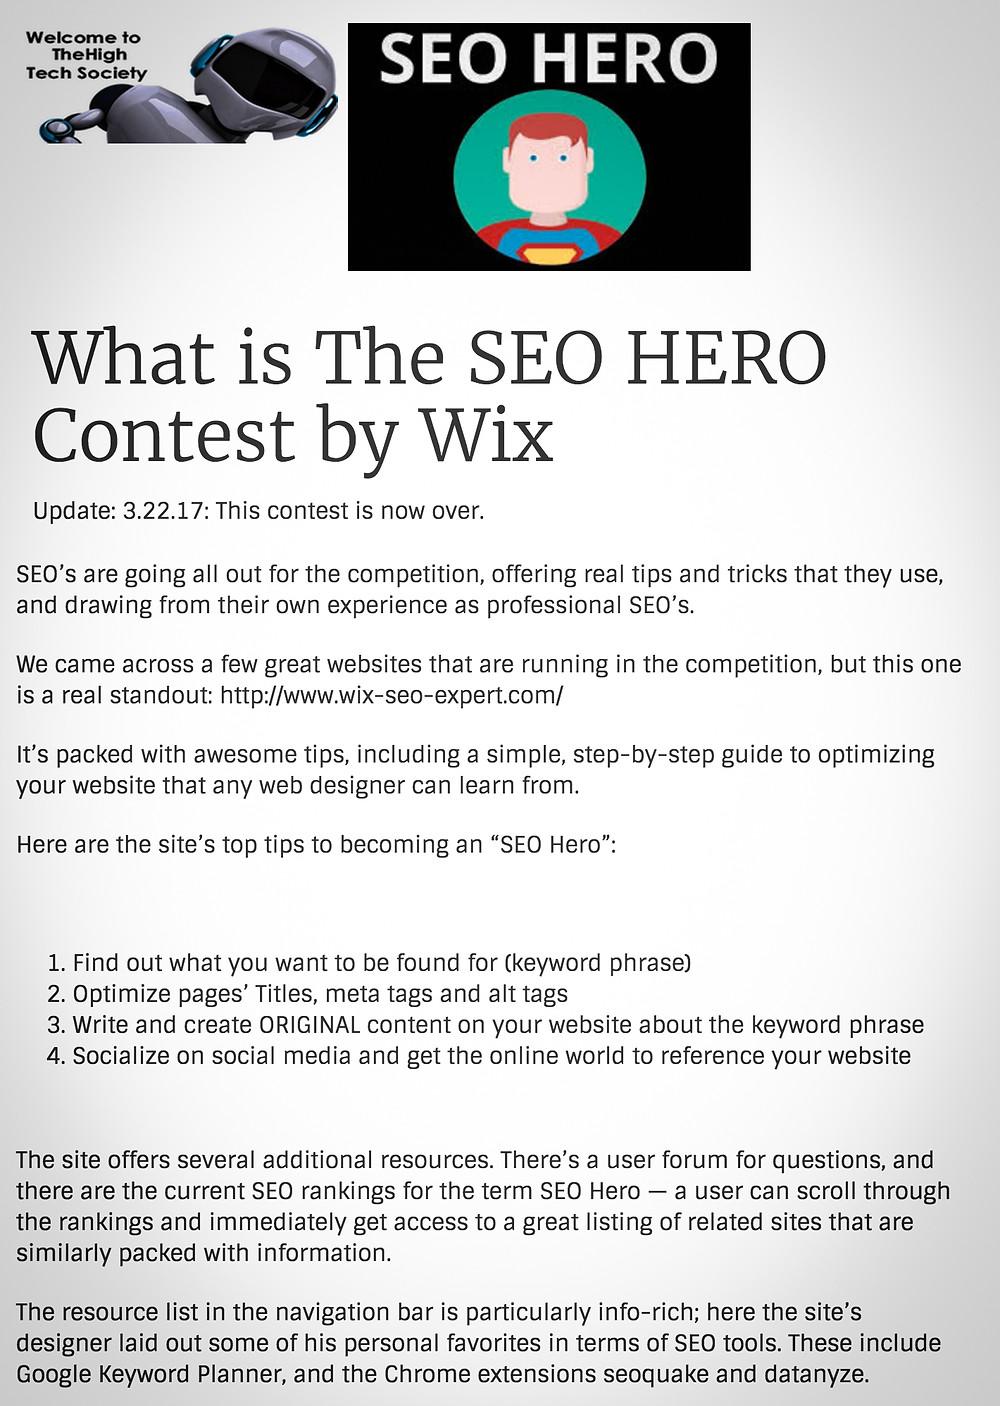 SEO Hero Article on The High Tech Society Website